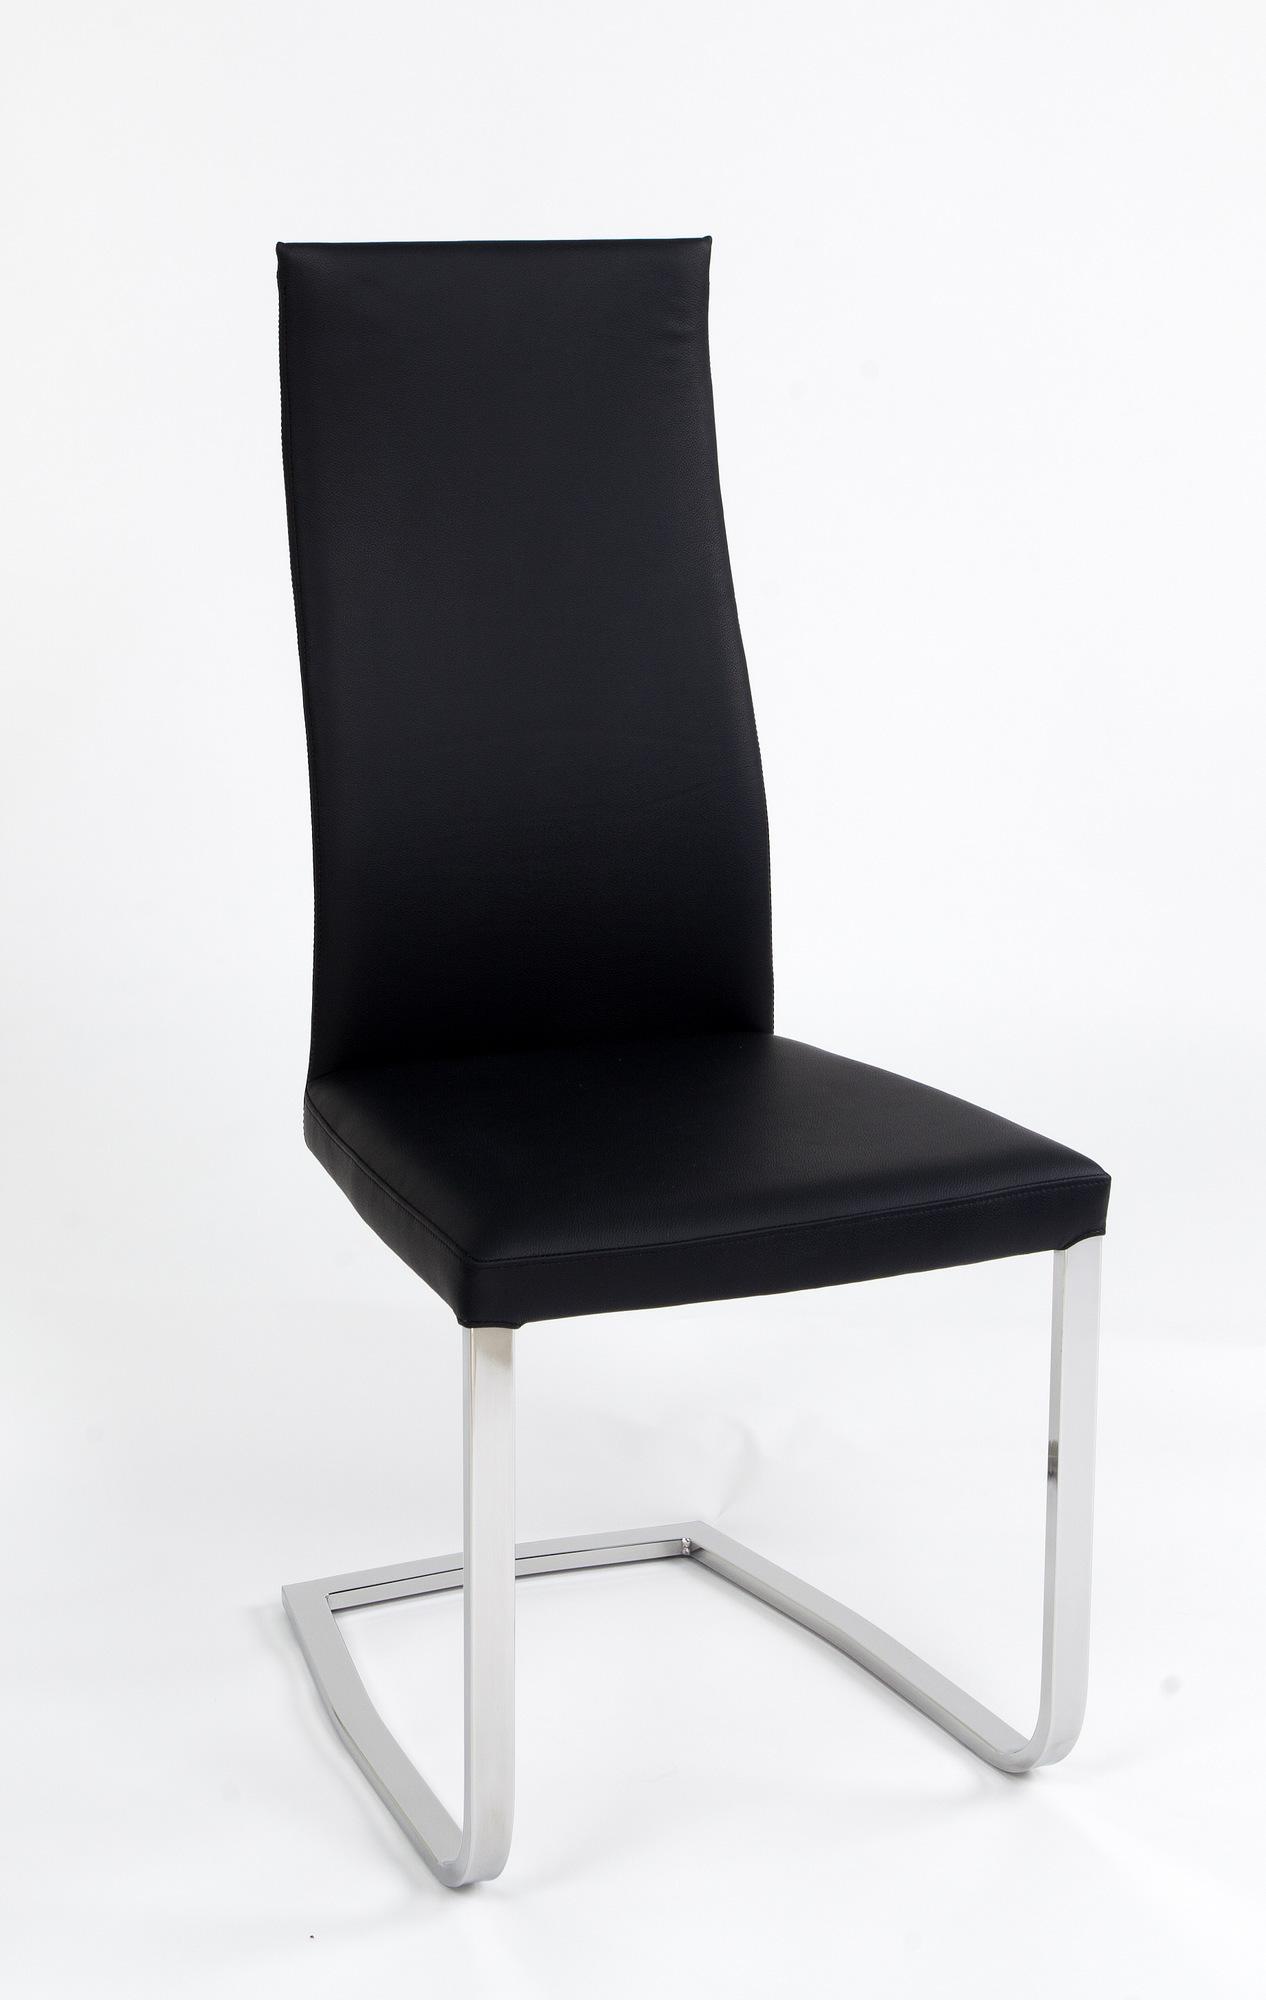 1519117947-essen-rebecca-stuhl-mit-lederbezug-schwarz.jpg